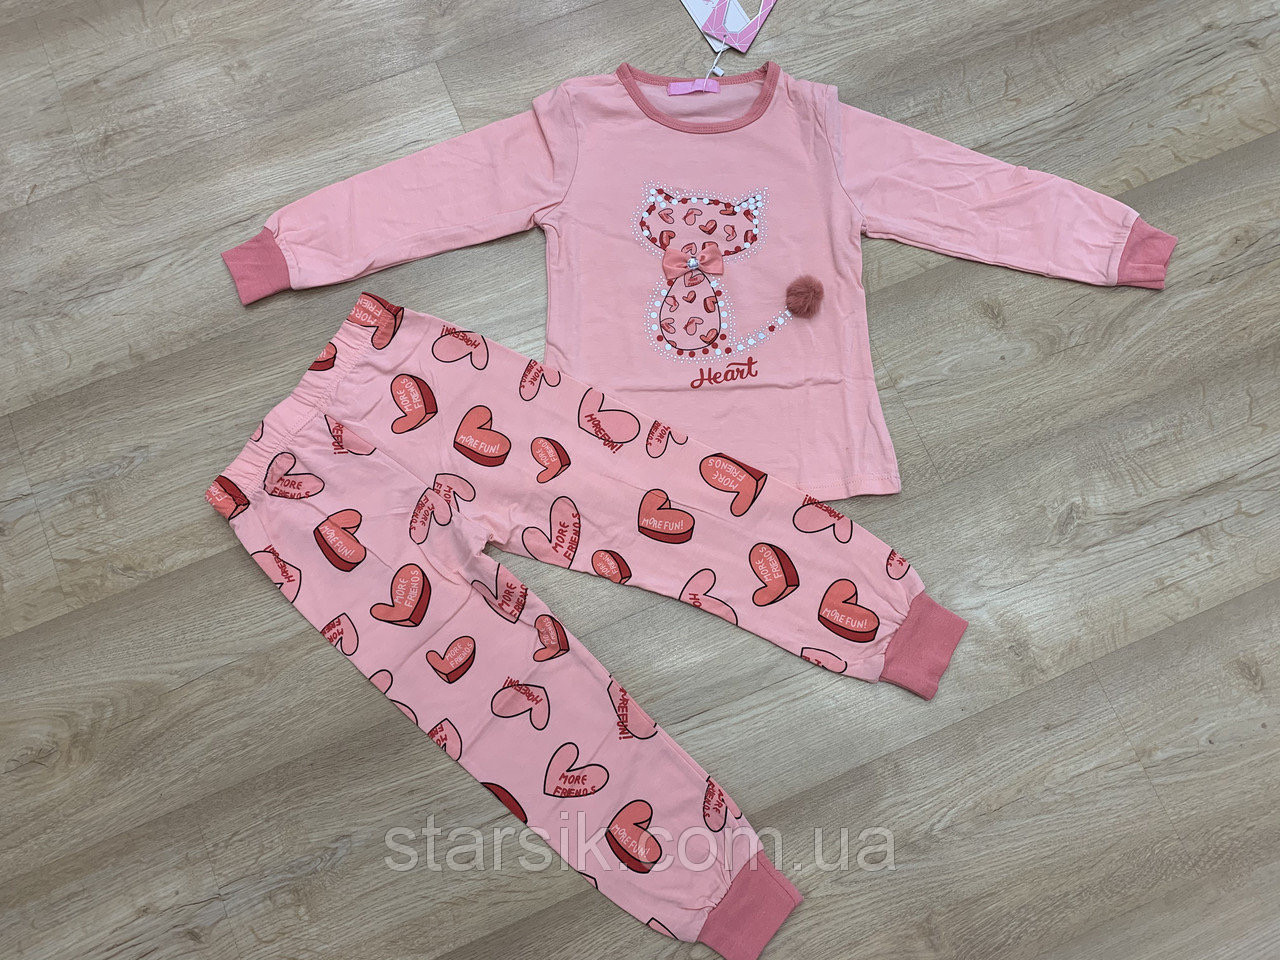 Пижама для девочек, Венгрия, Setty Koop, рр. 104-110, арт. PJM041